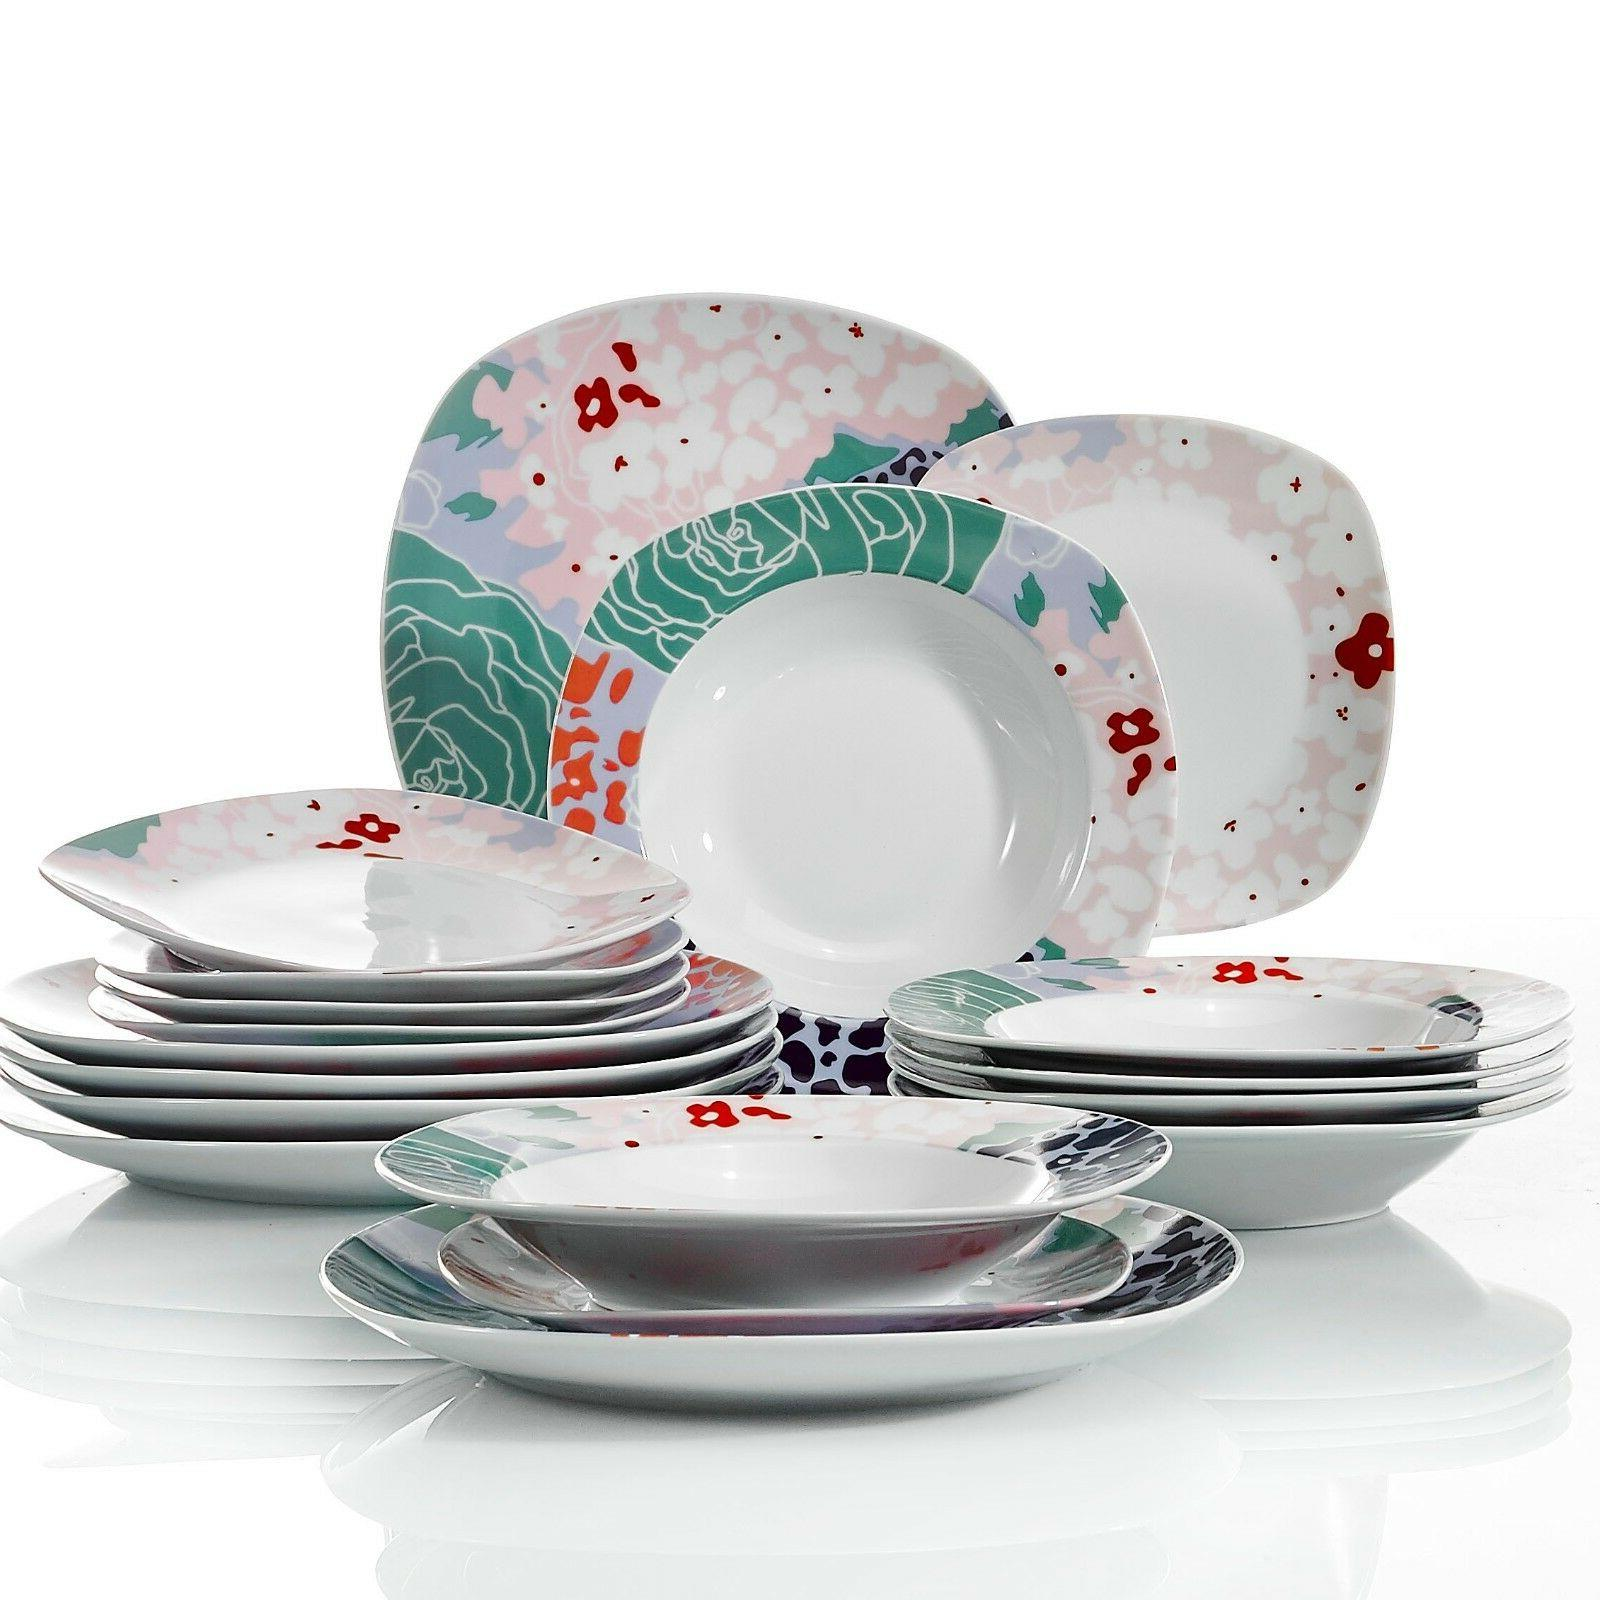 VEWEET Dinnerware Set color Patterns Kitchen Plate Sets